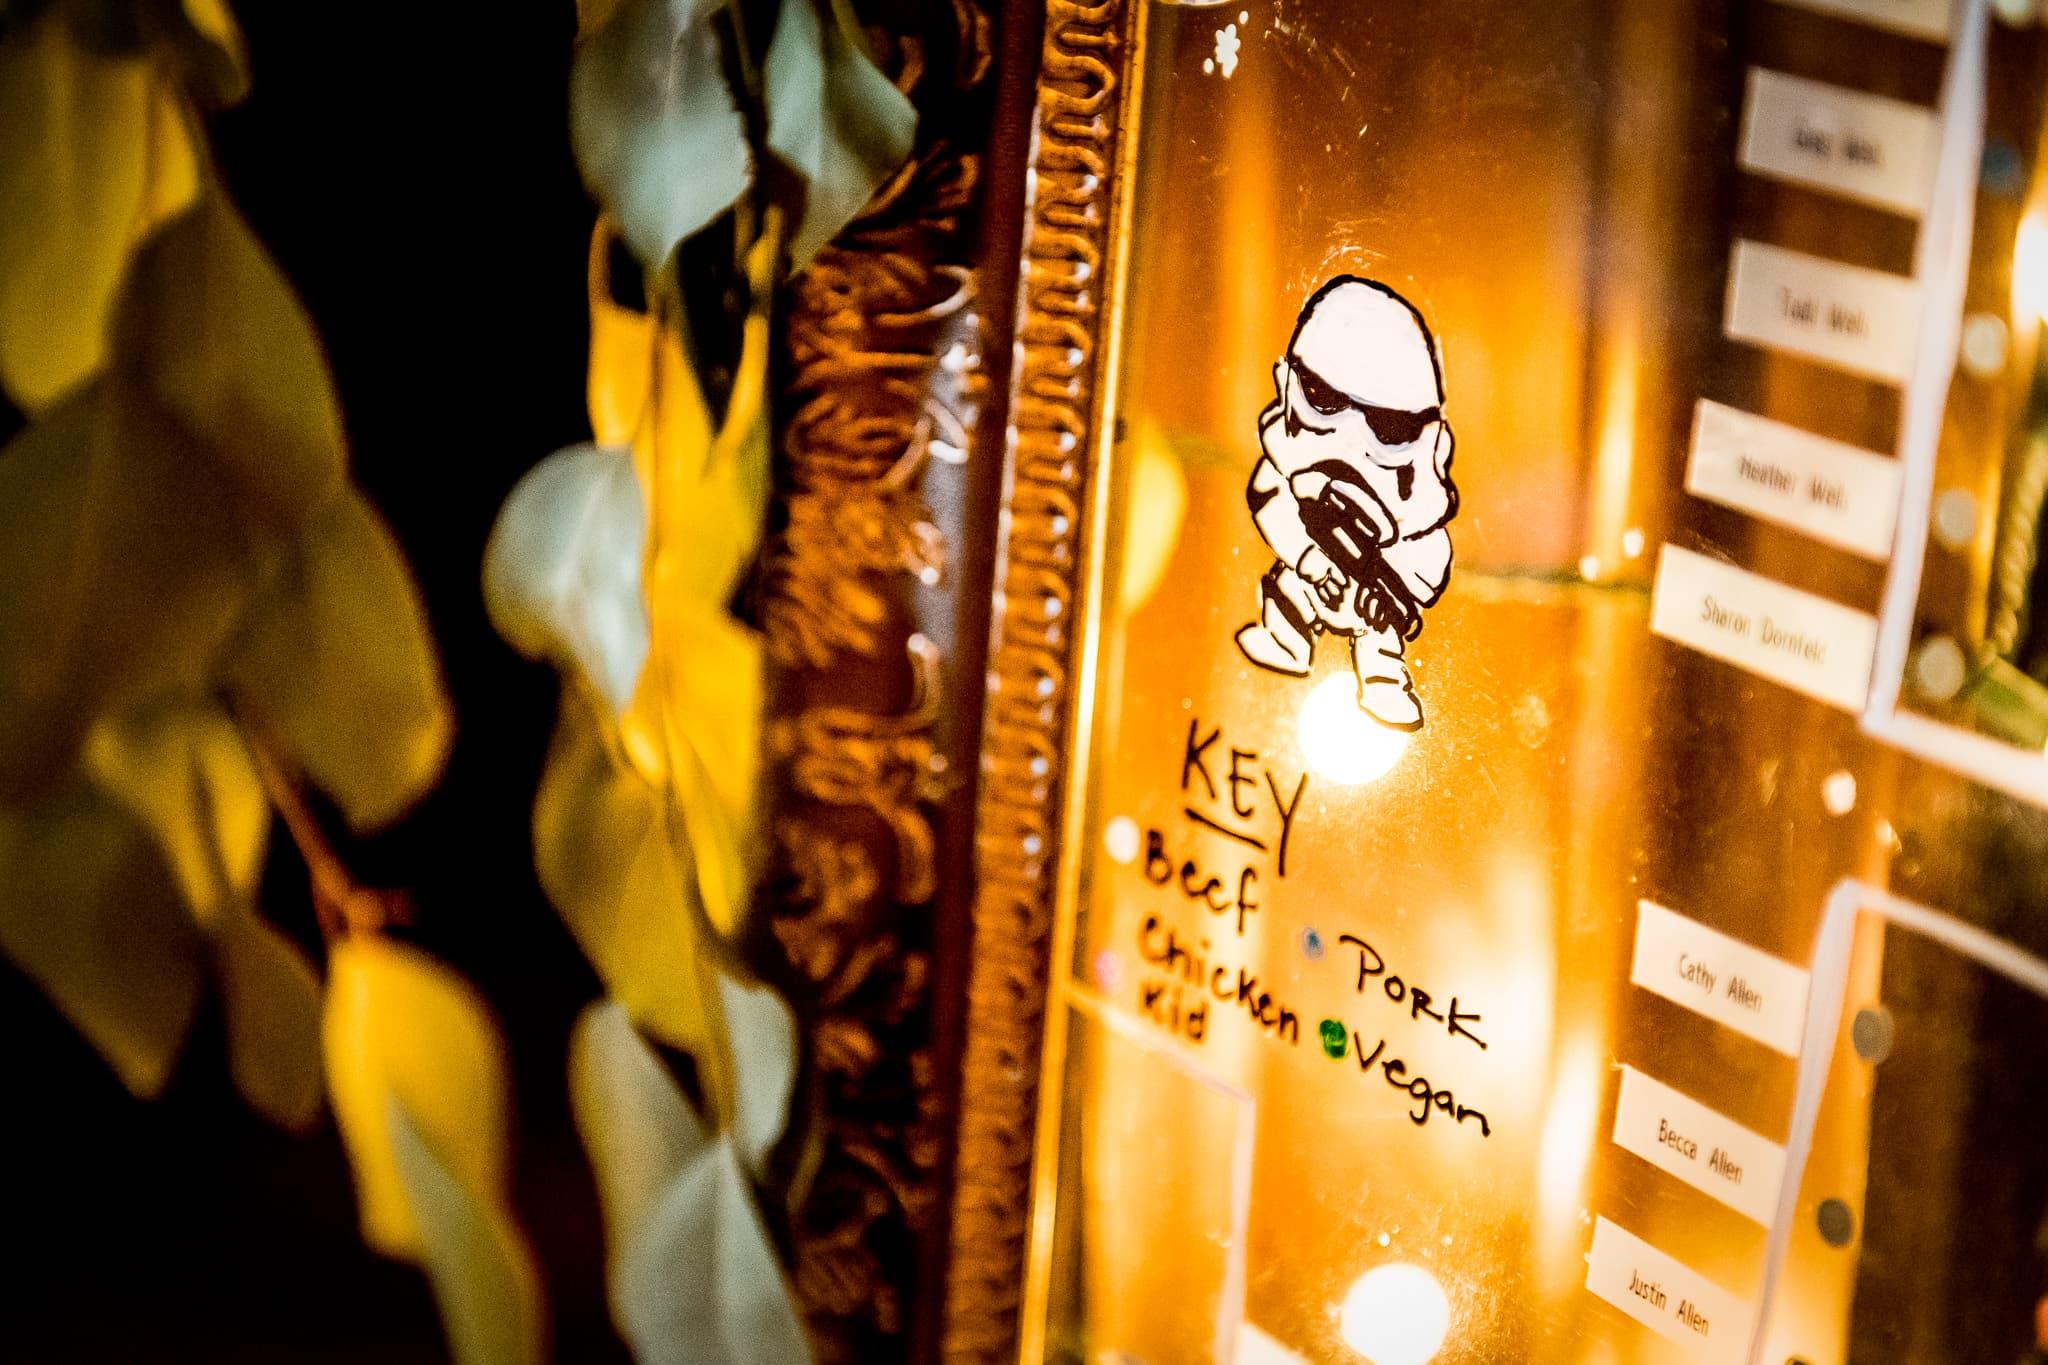 Aster Cafe Star Wars Theme Details 10